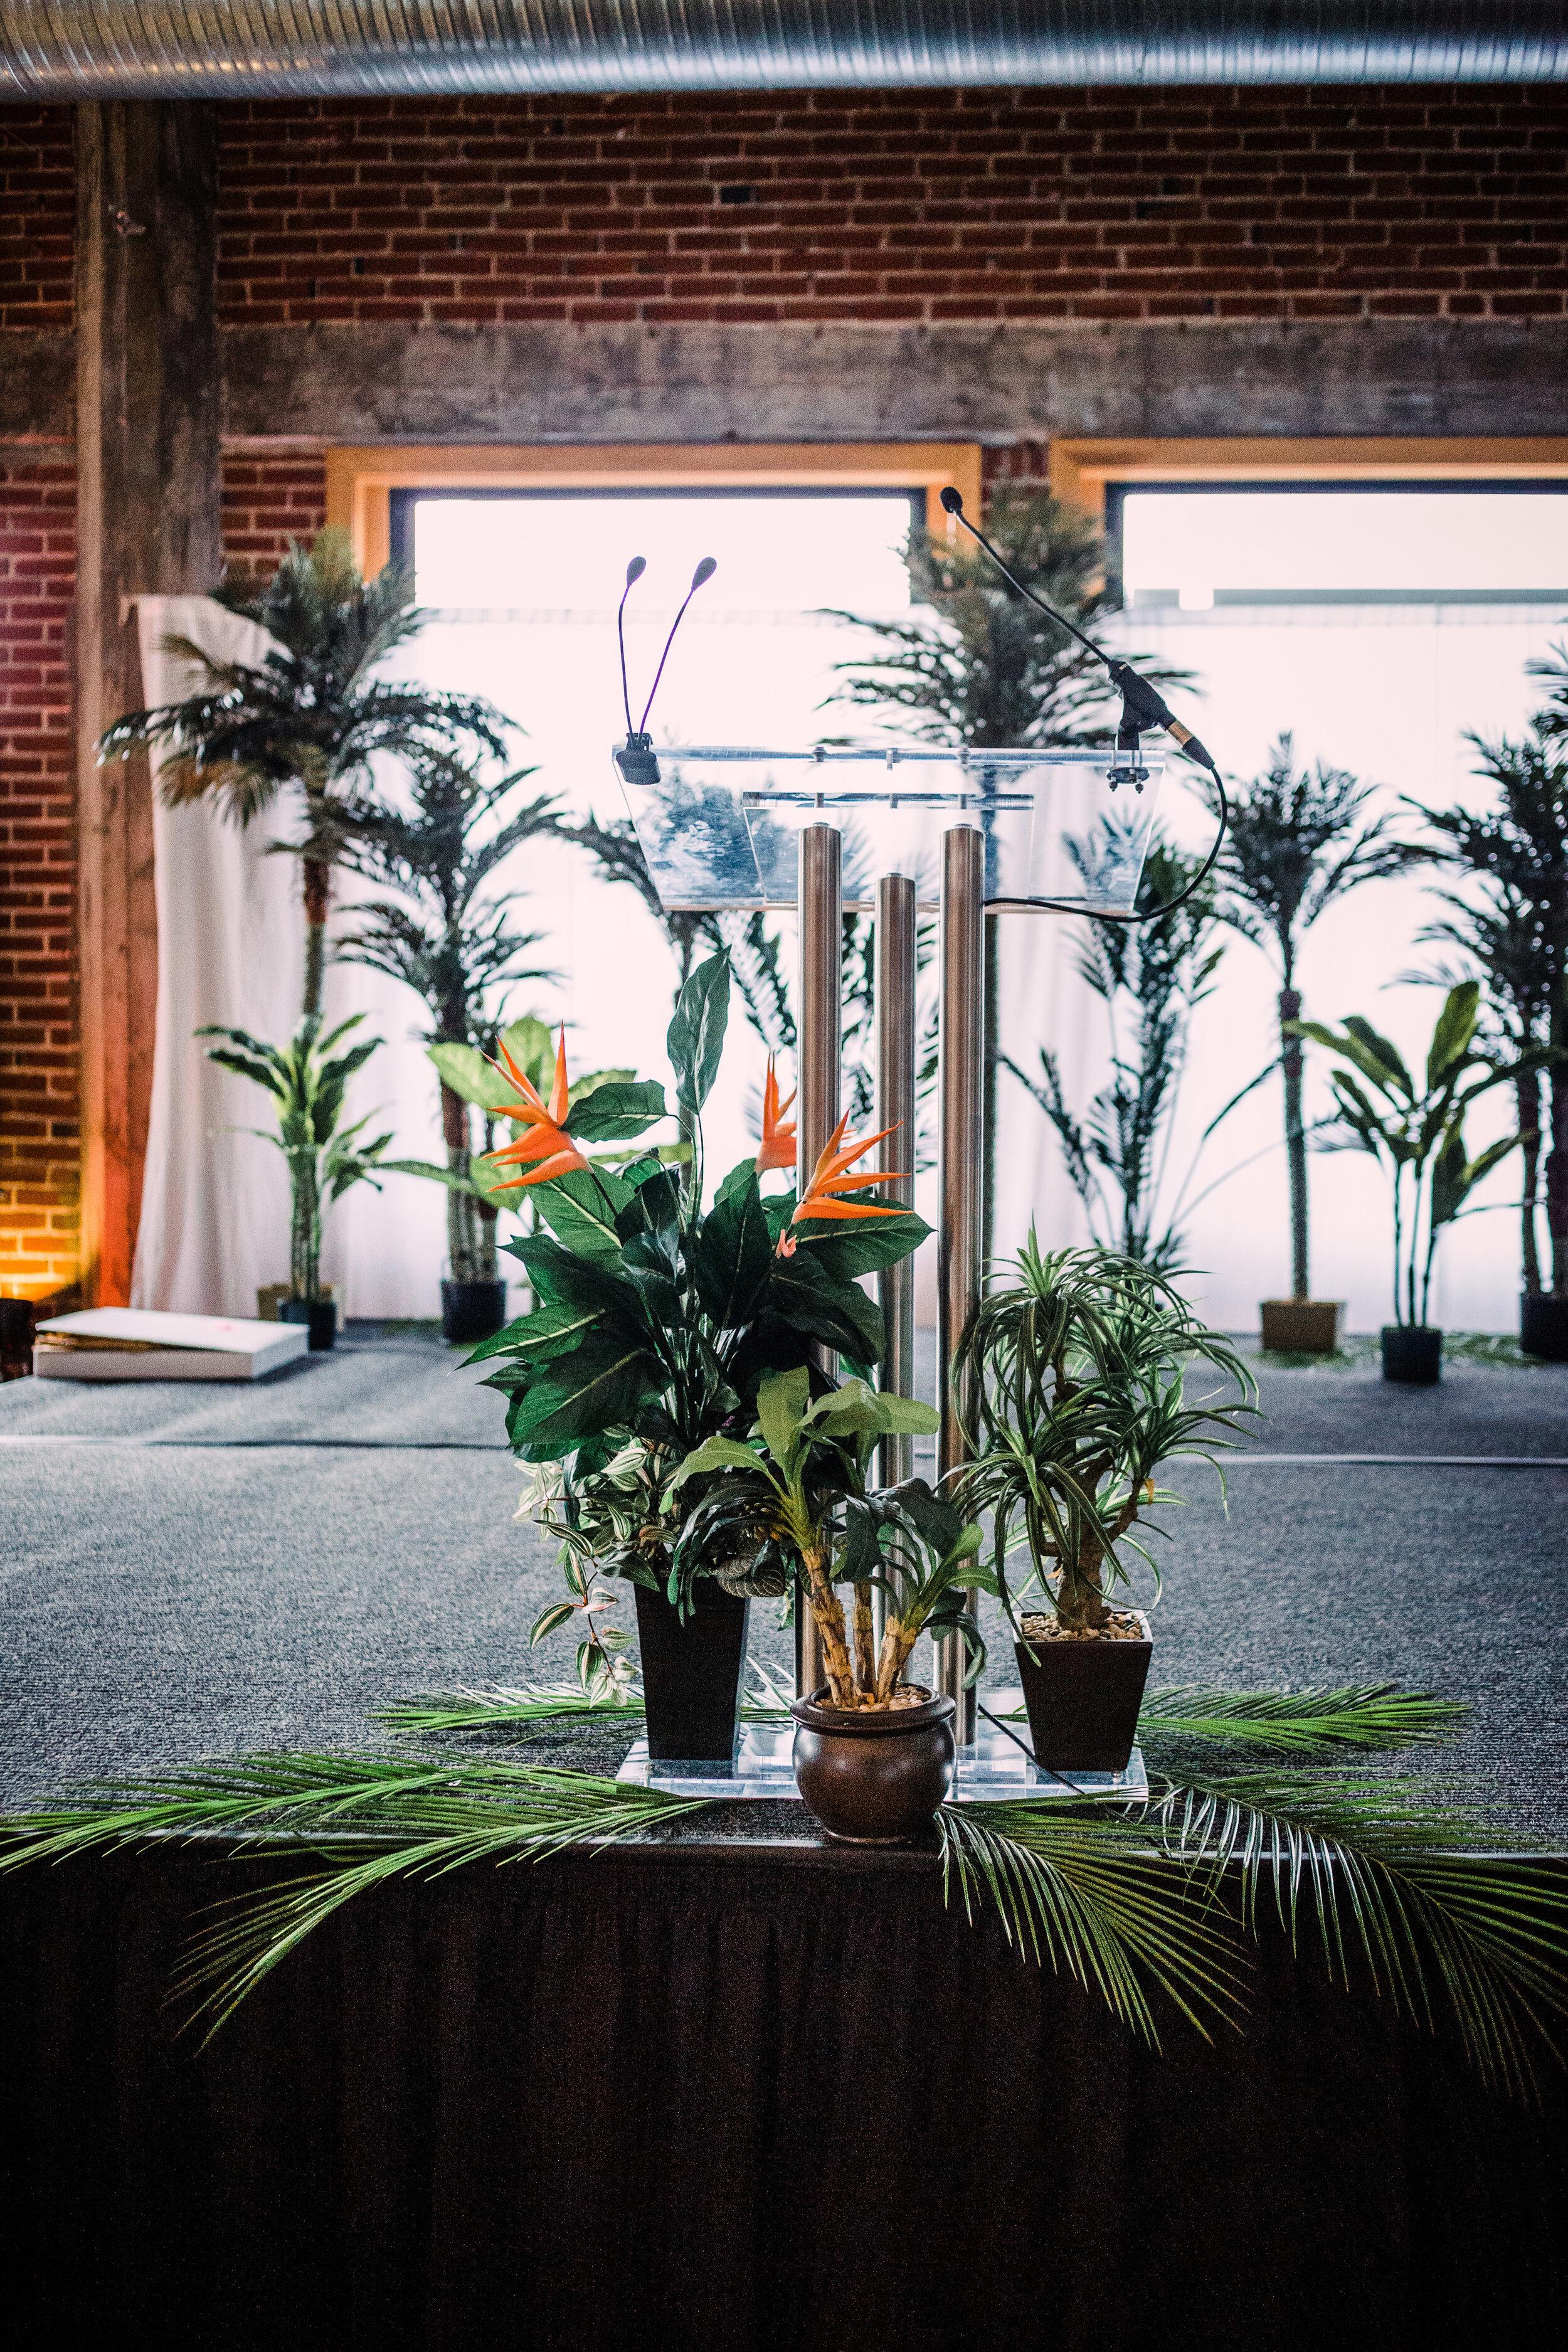 Island silk palm trees